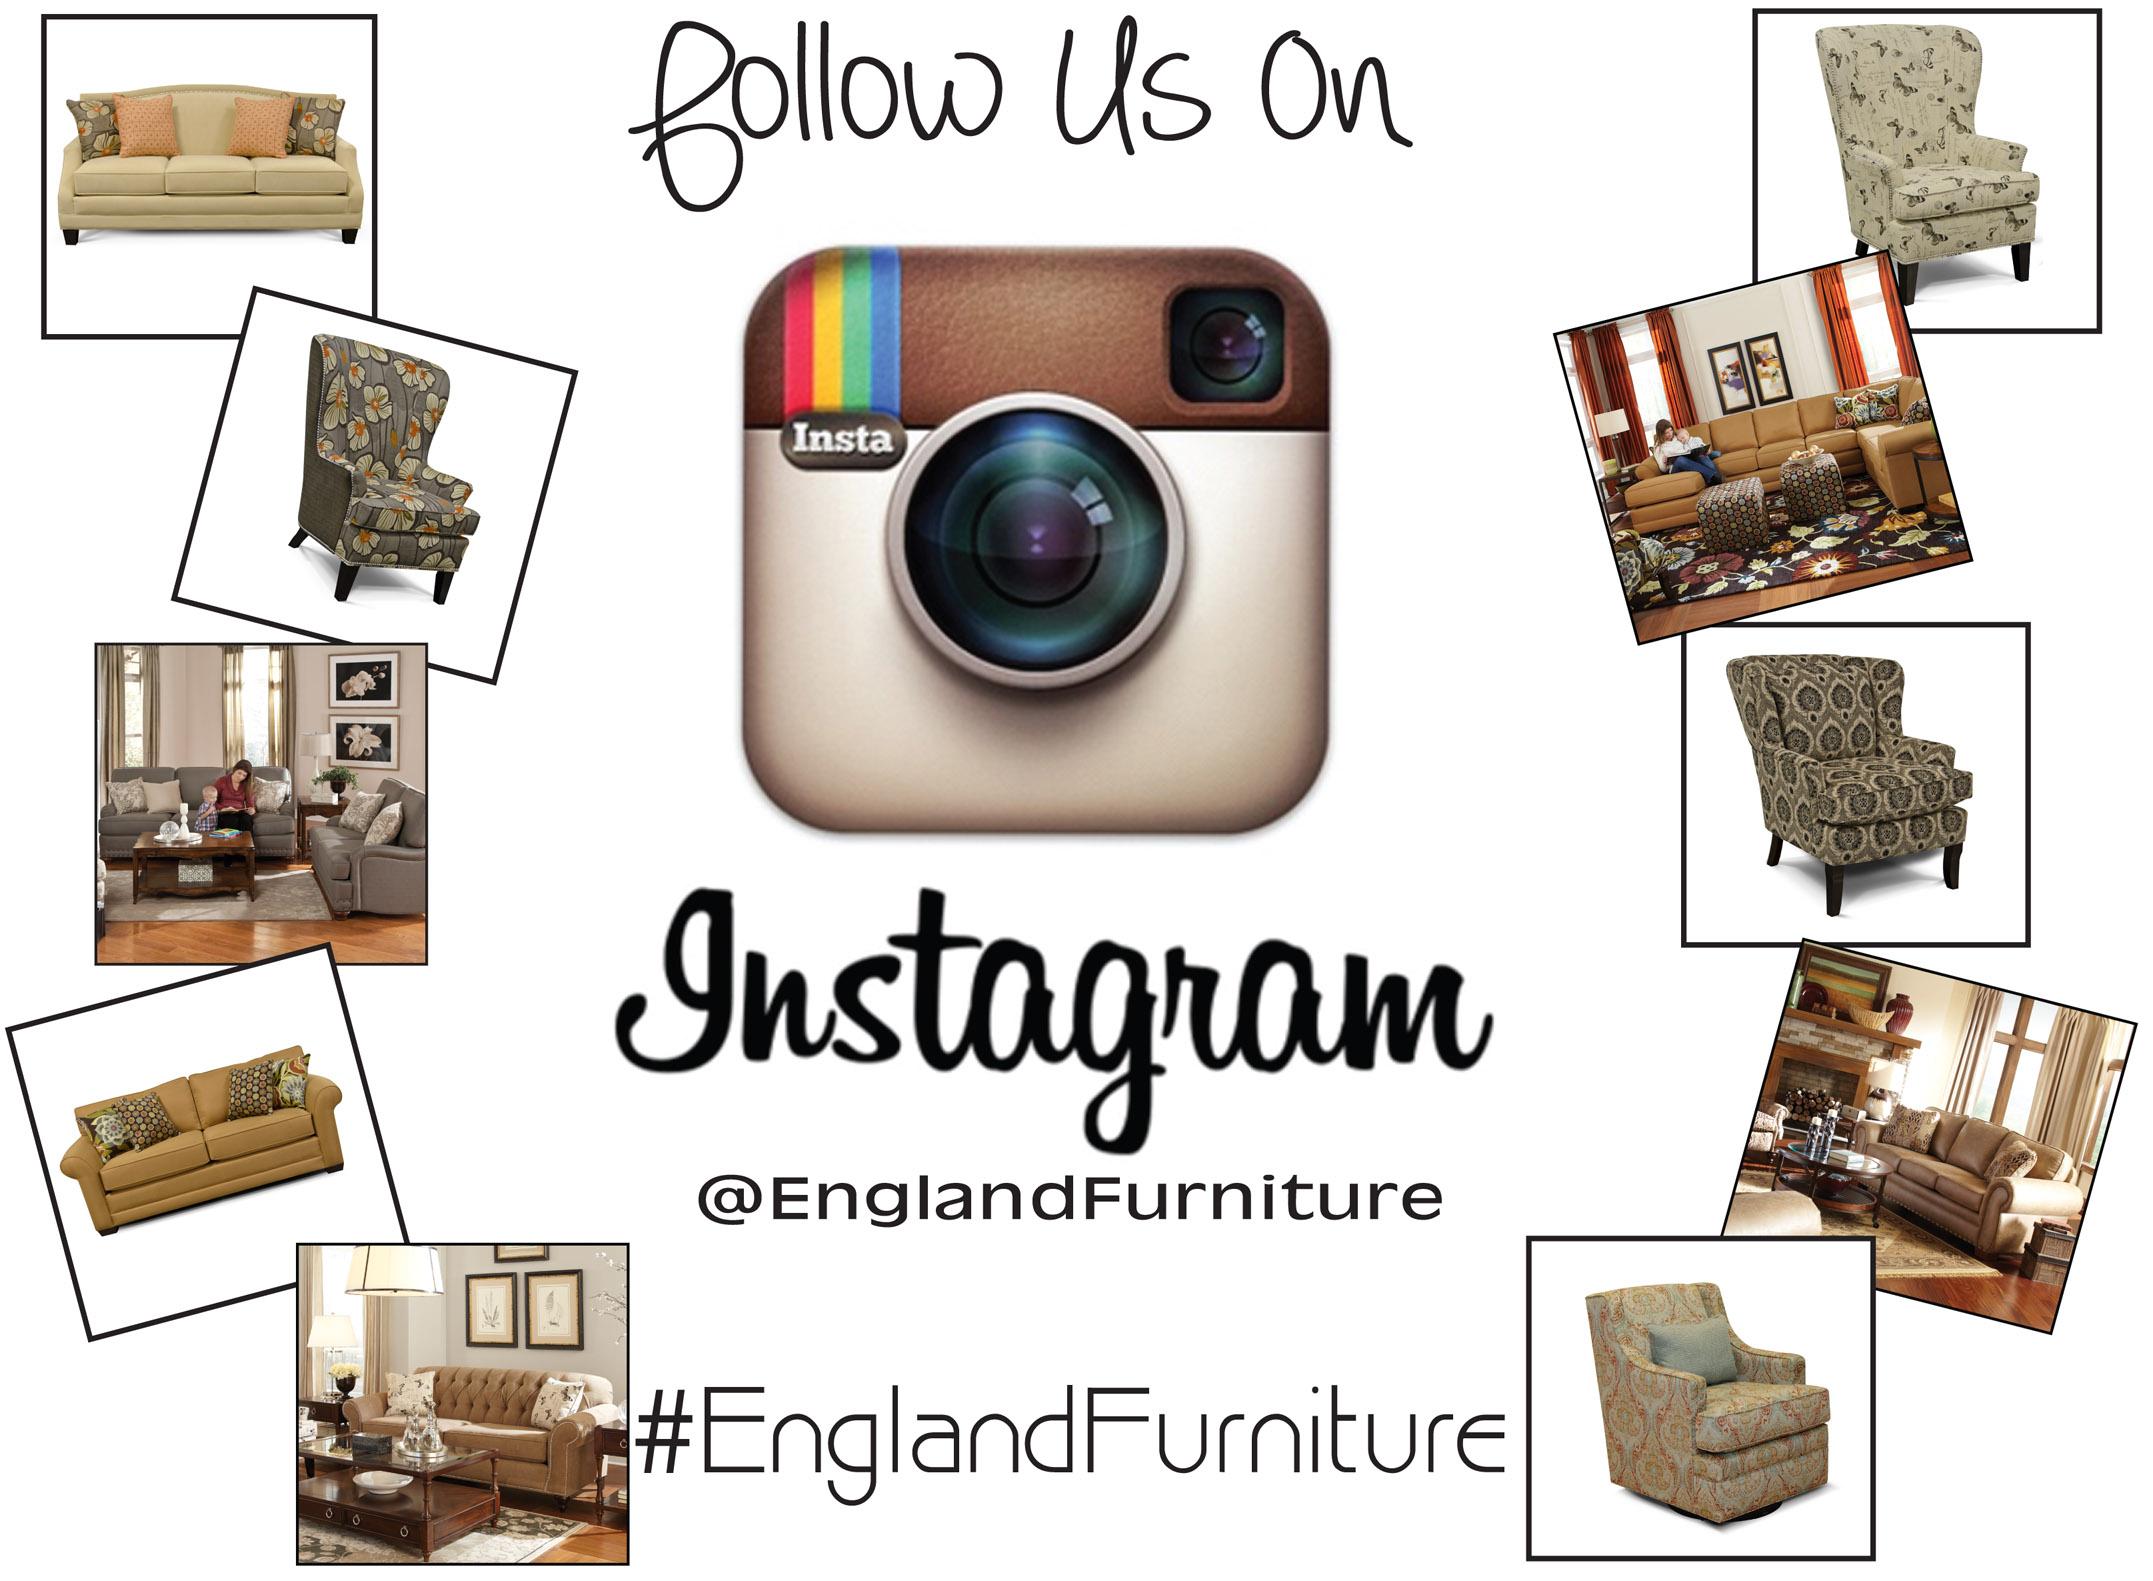 England Furniture on Instagram